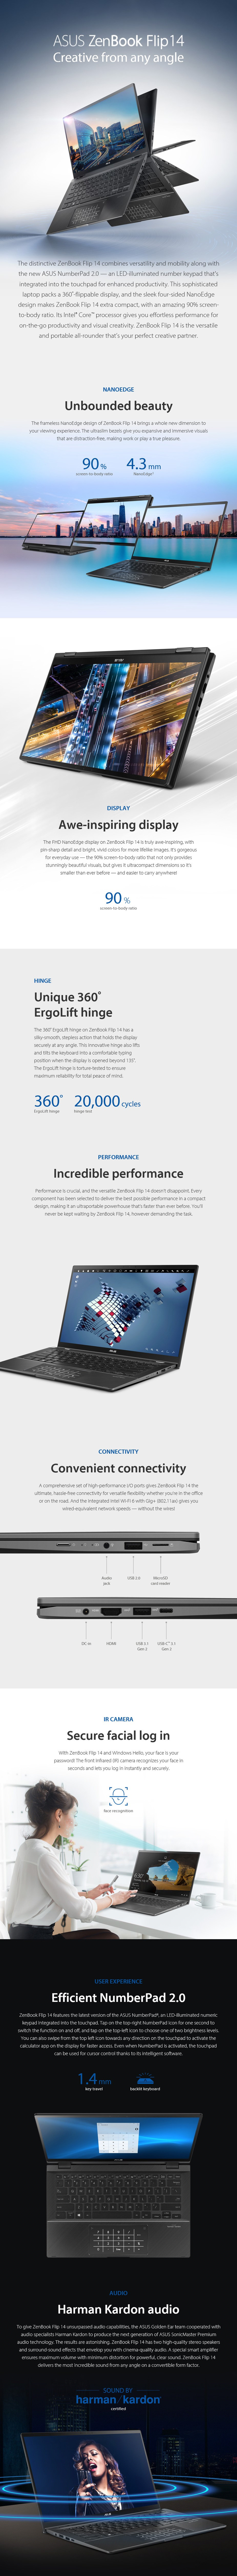 asus-zenbook-flip-14-ux463fa-14-laptop-i510210u-8gb-512gb-w10p-touch-ac32598-7.jpg